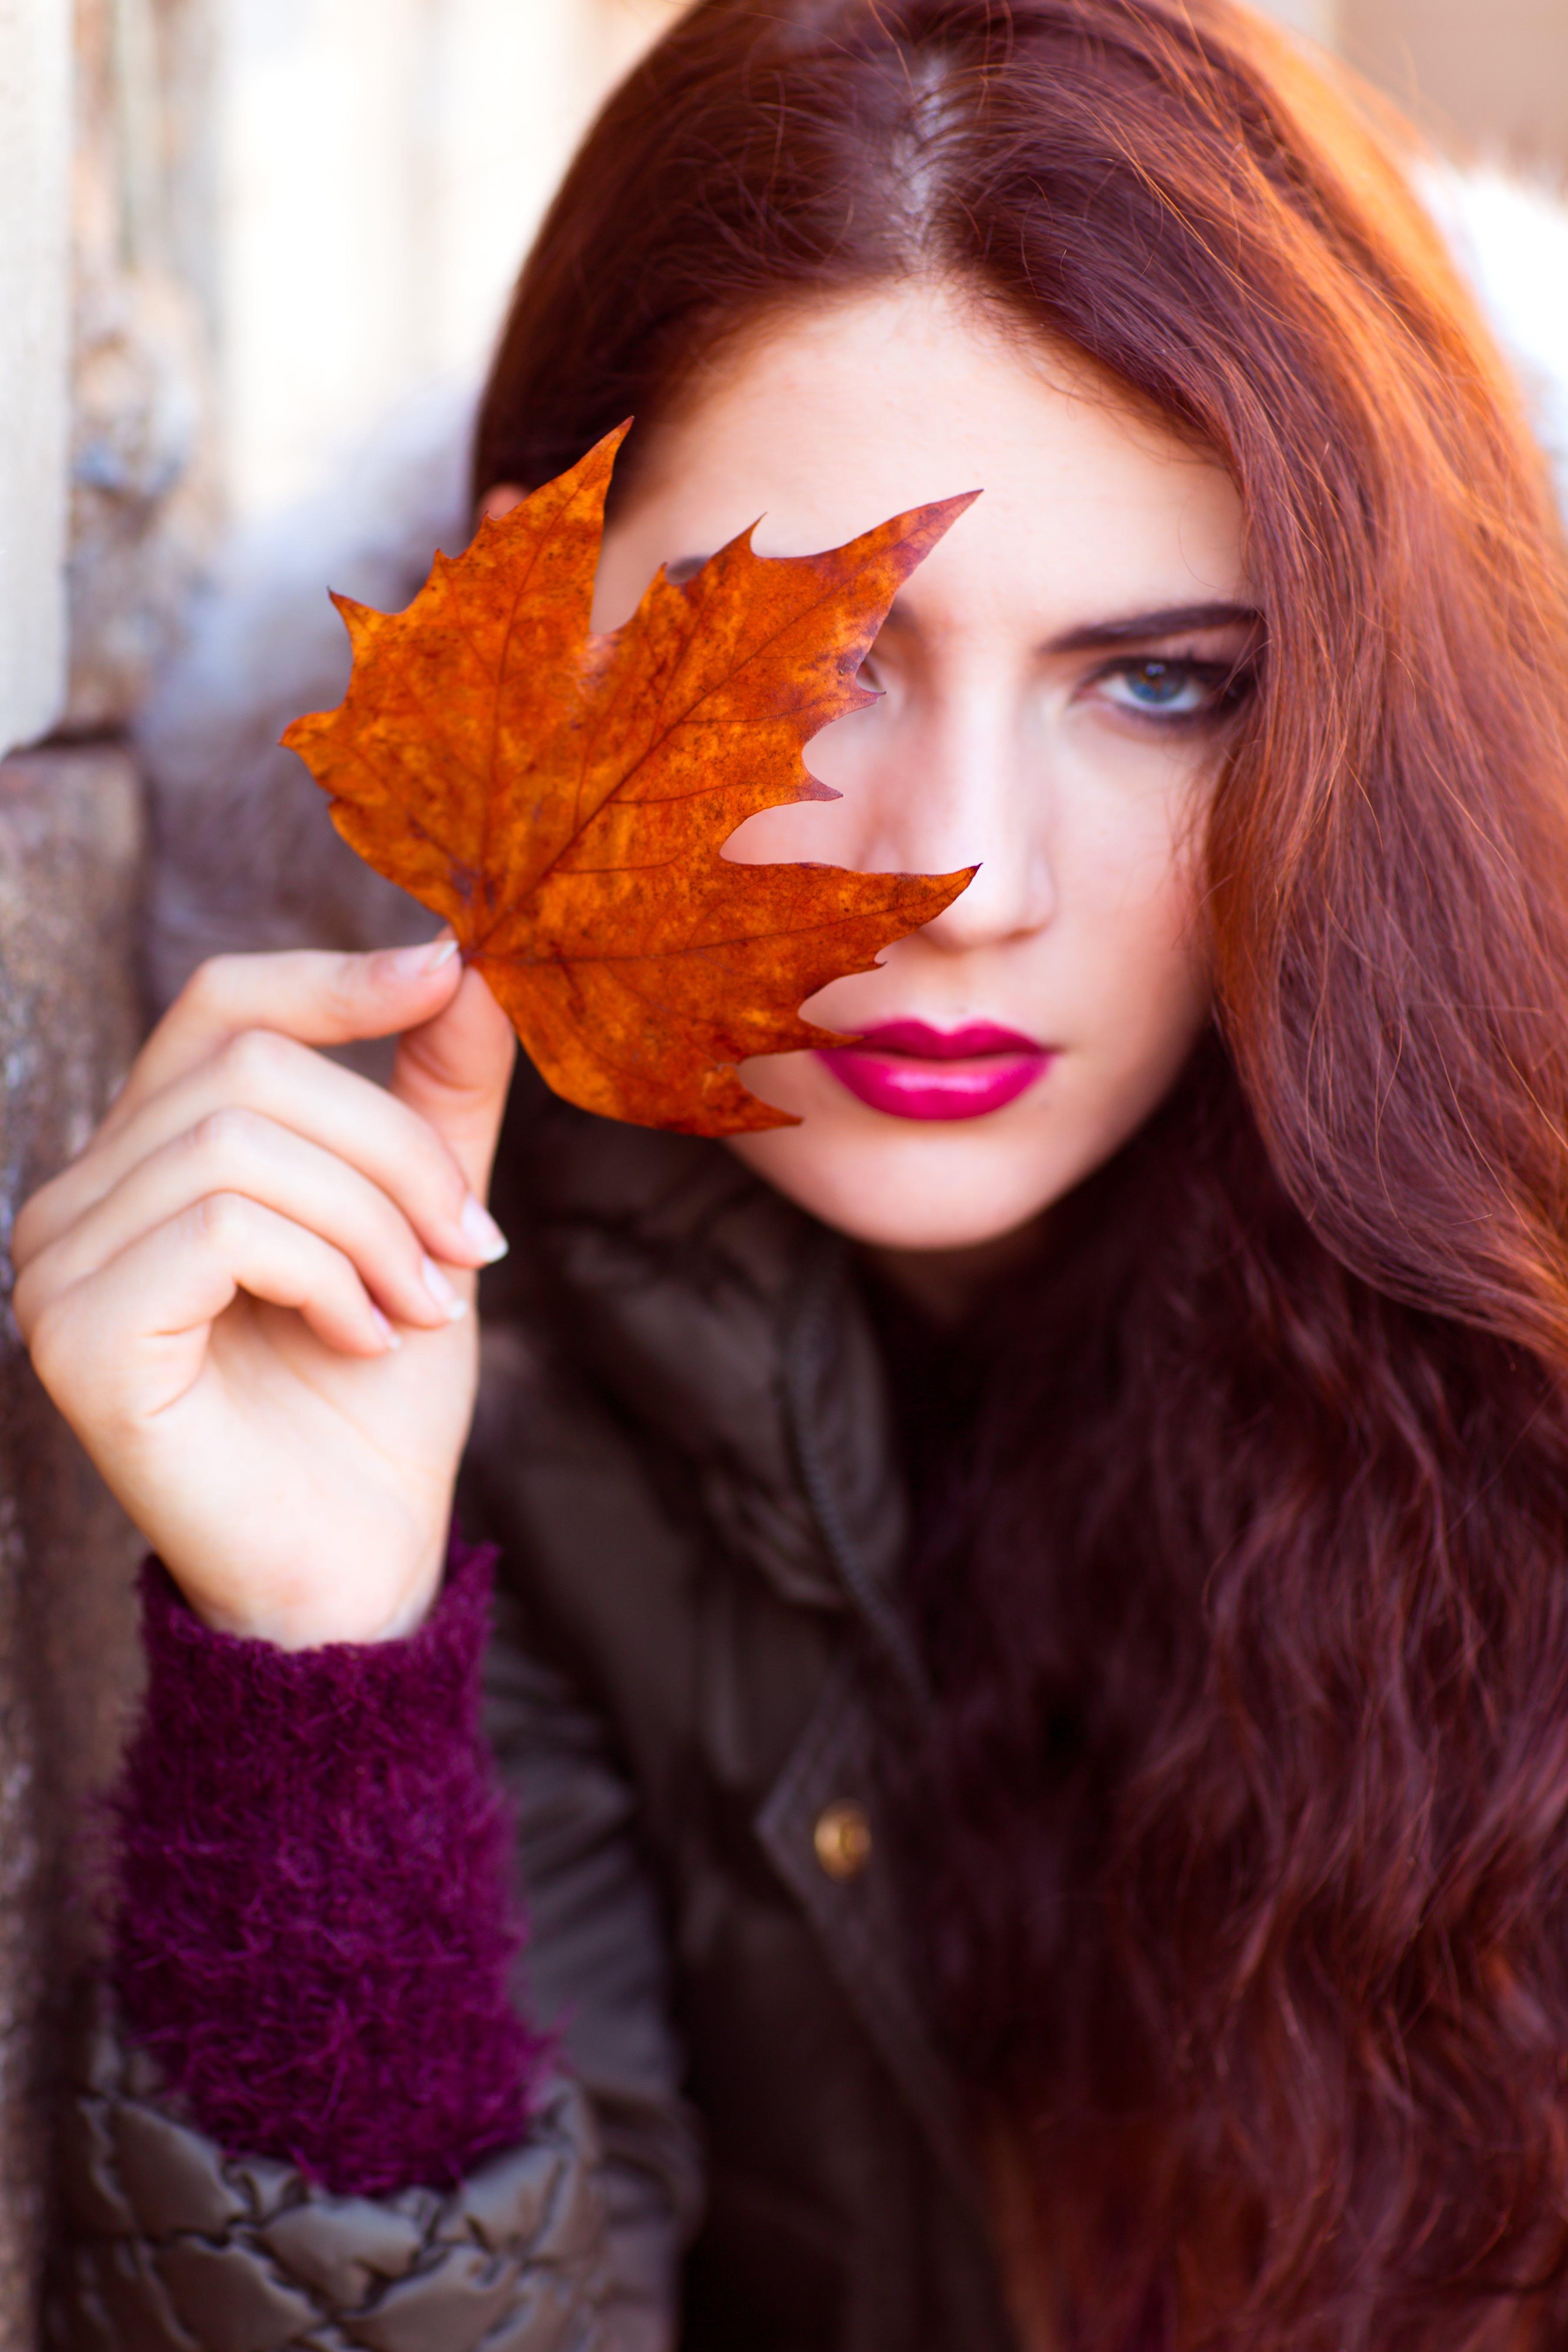 Woman Wearing Black Zip-up Jacket Holding Brown Maple Leaf